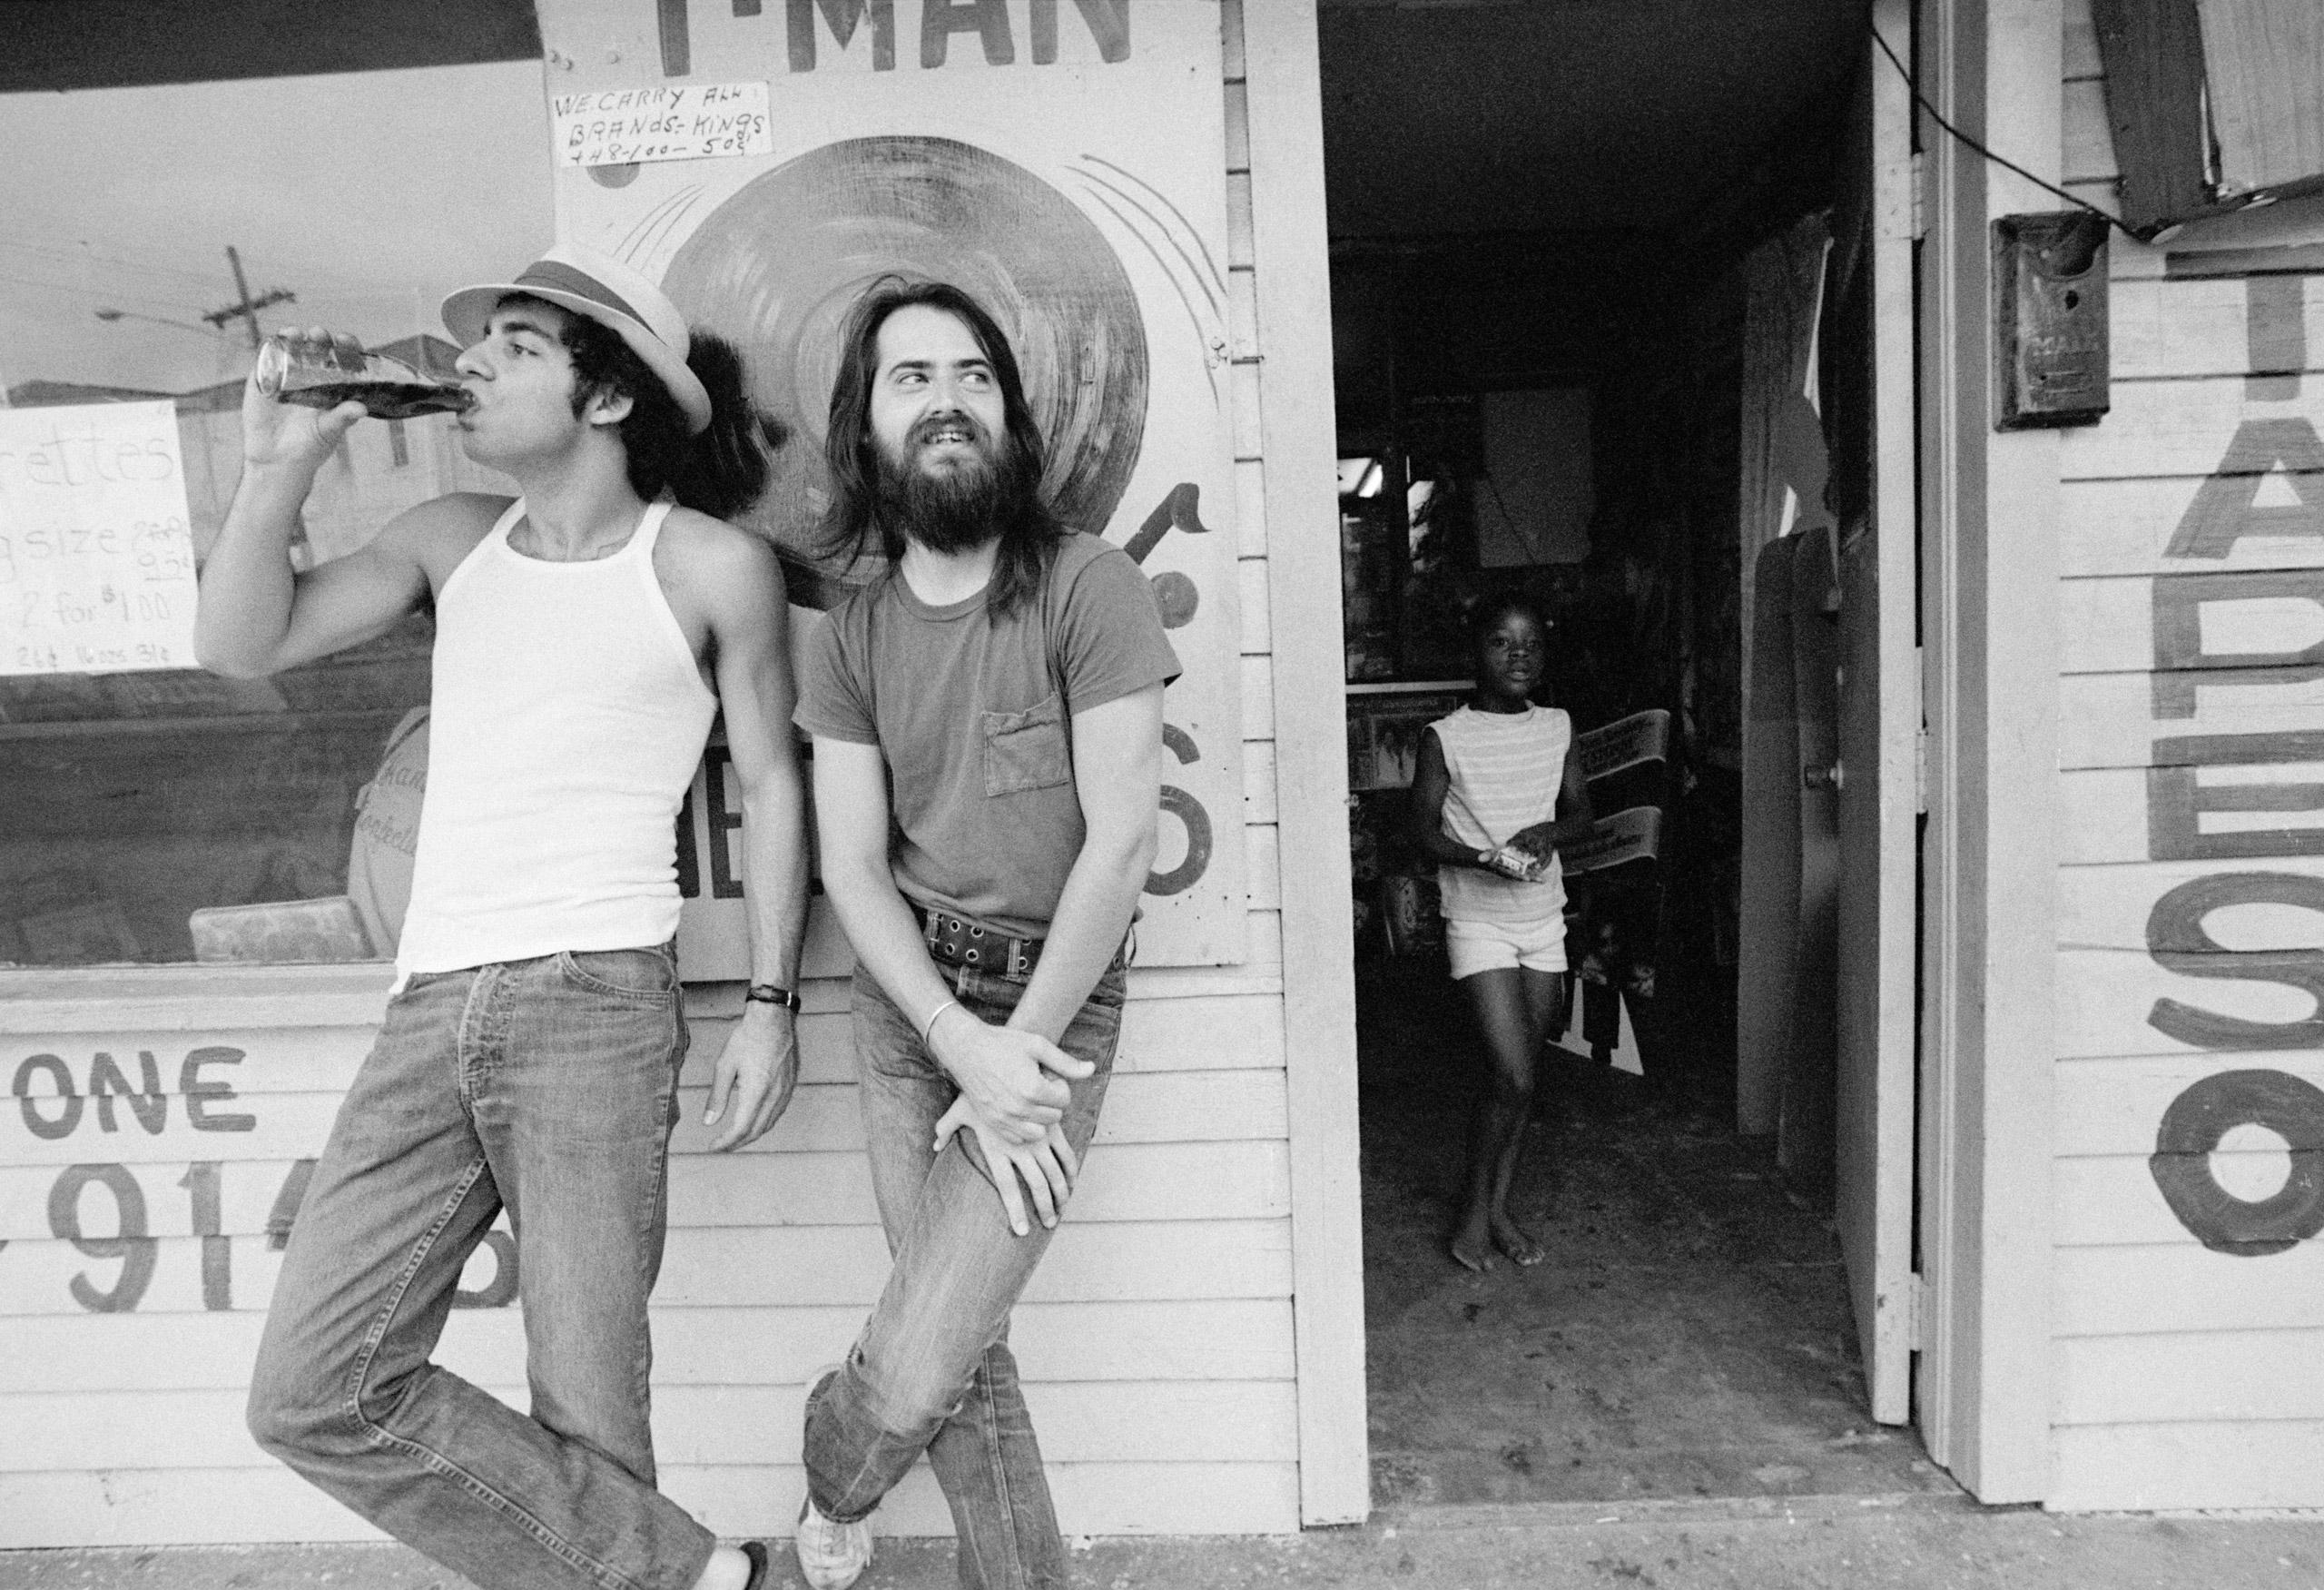 Steve Van Zandt and Garry Tallent in New Orleans.